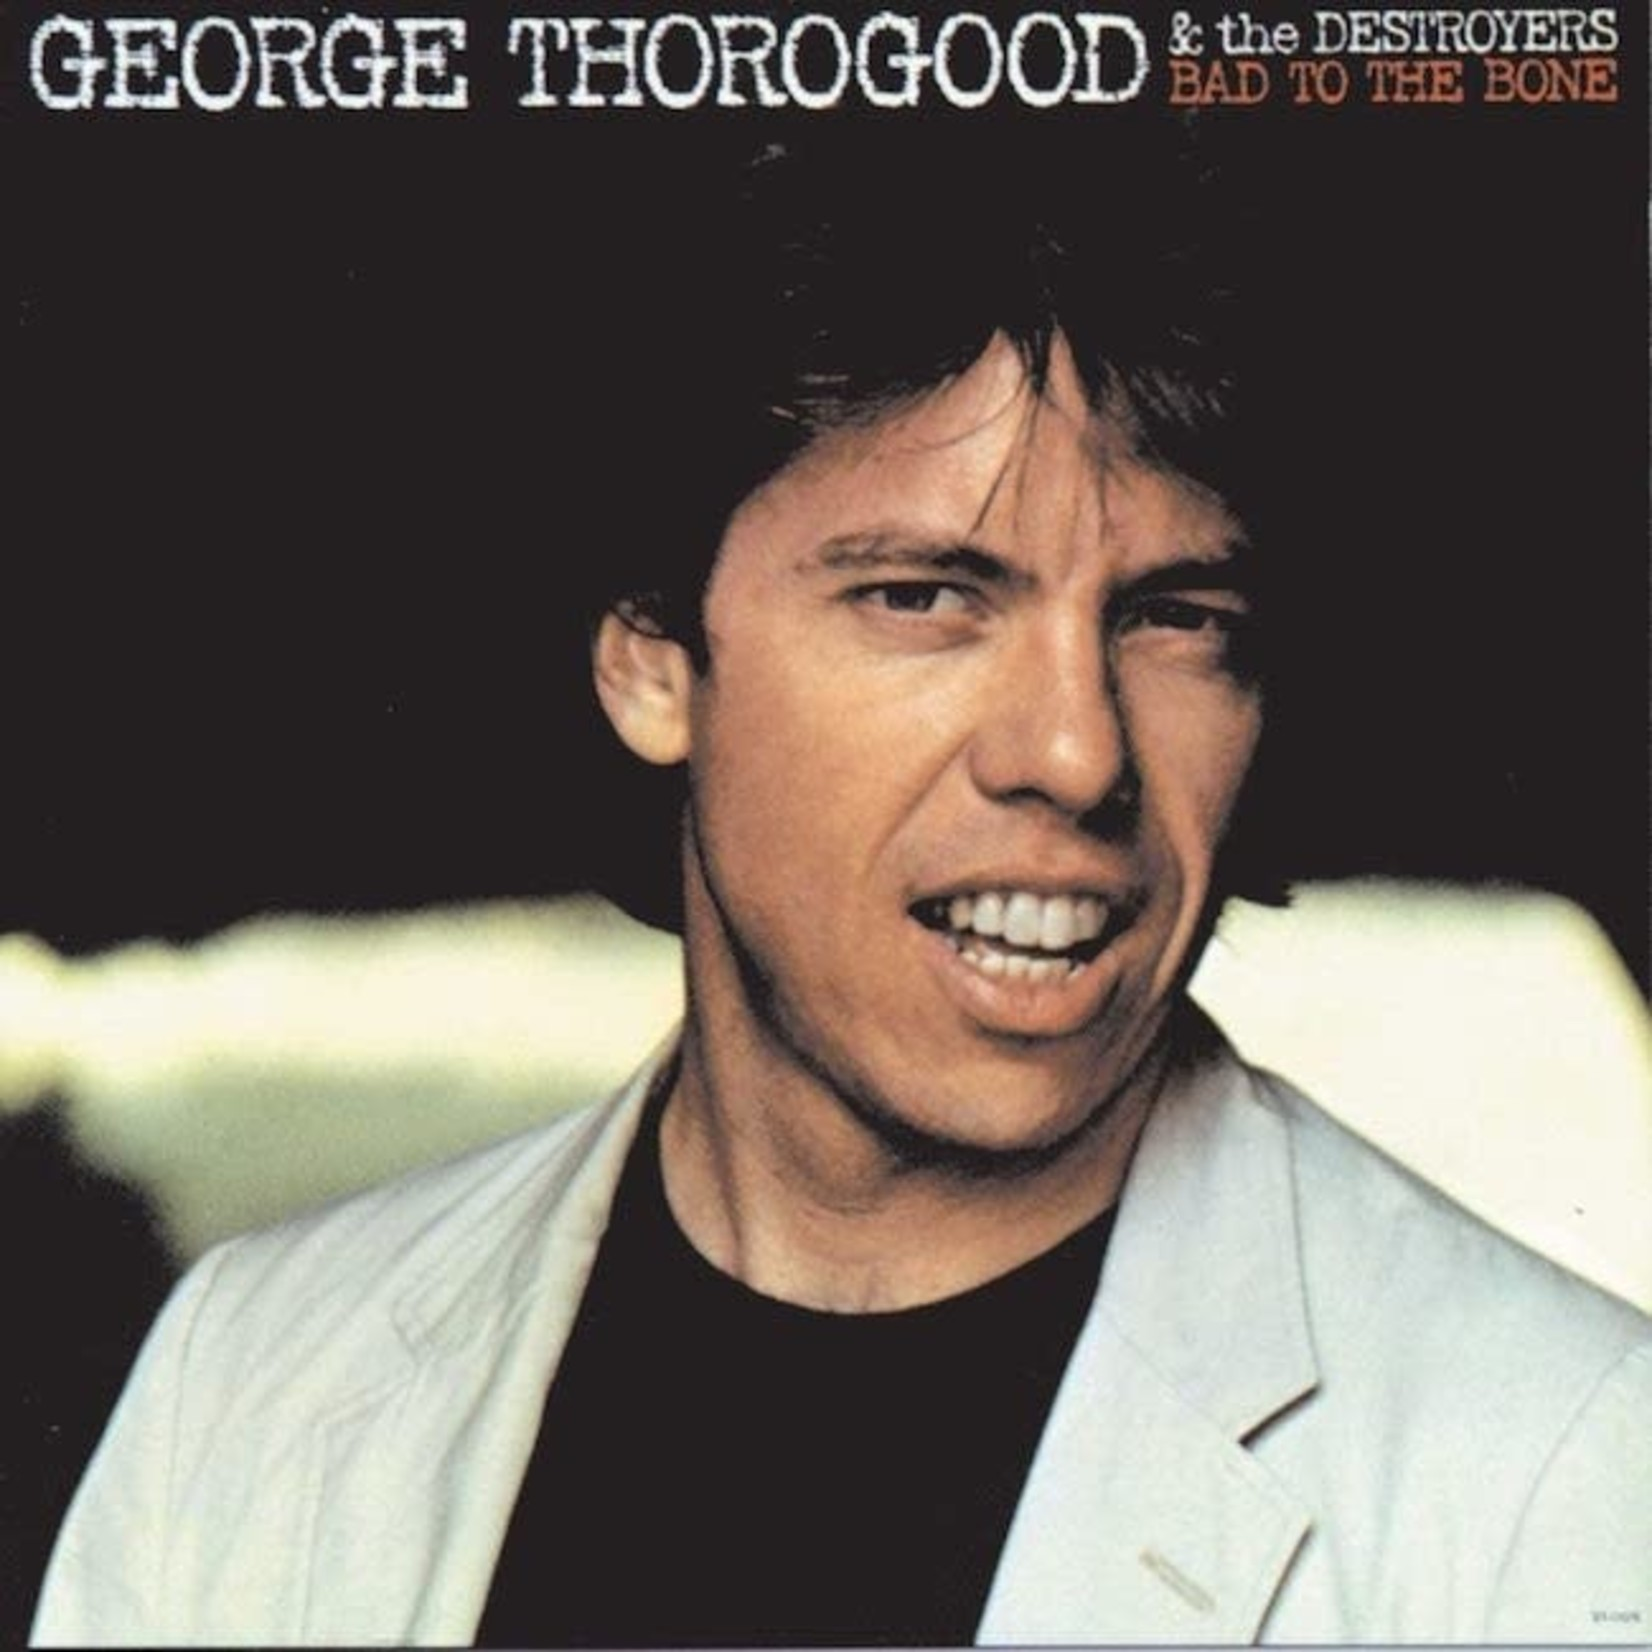 [Vintage] Thorogood, George: Bad to the Bone